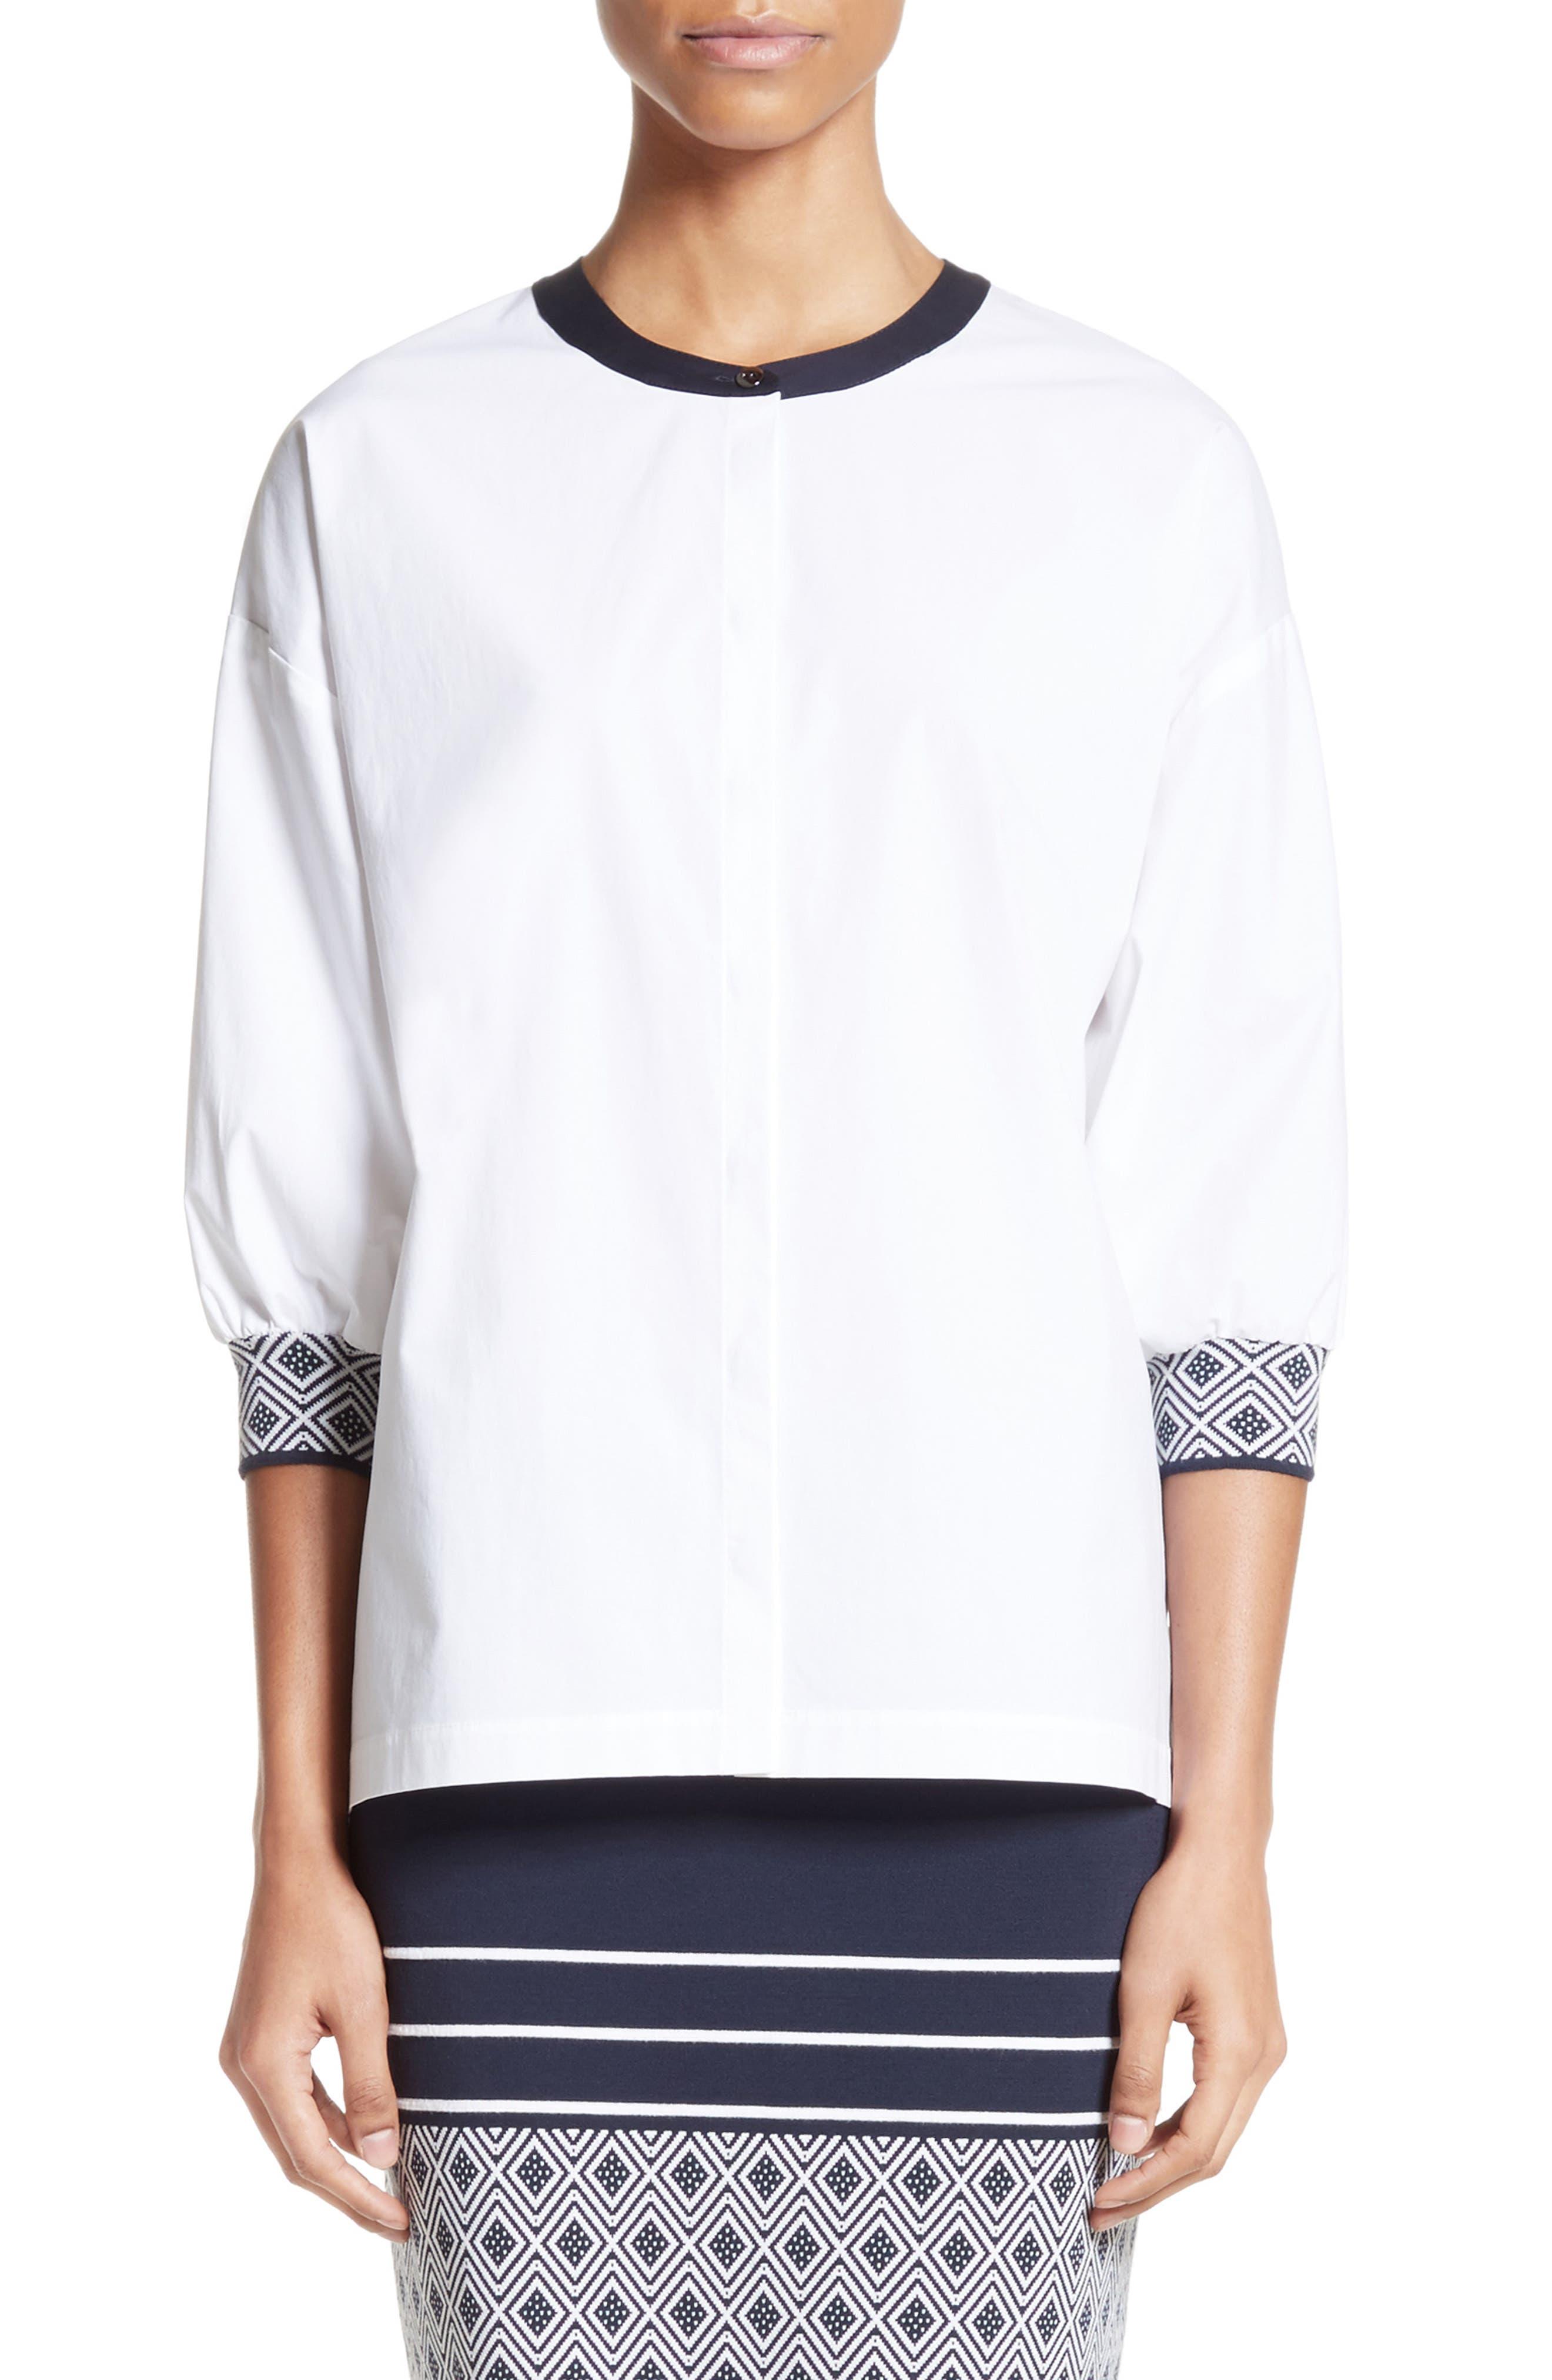 Devika Tile Techno Stretch Cotton Shirt,                         Main,                         color, Bianco/ Navy